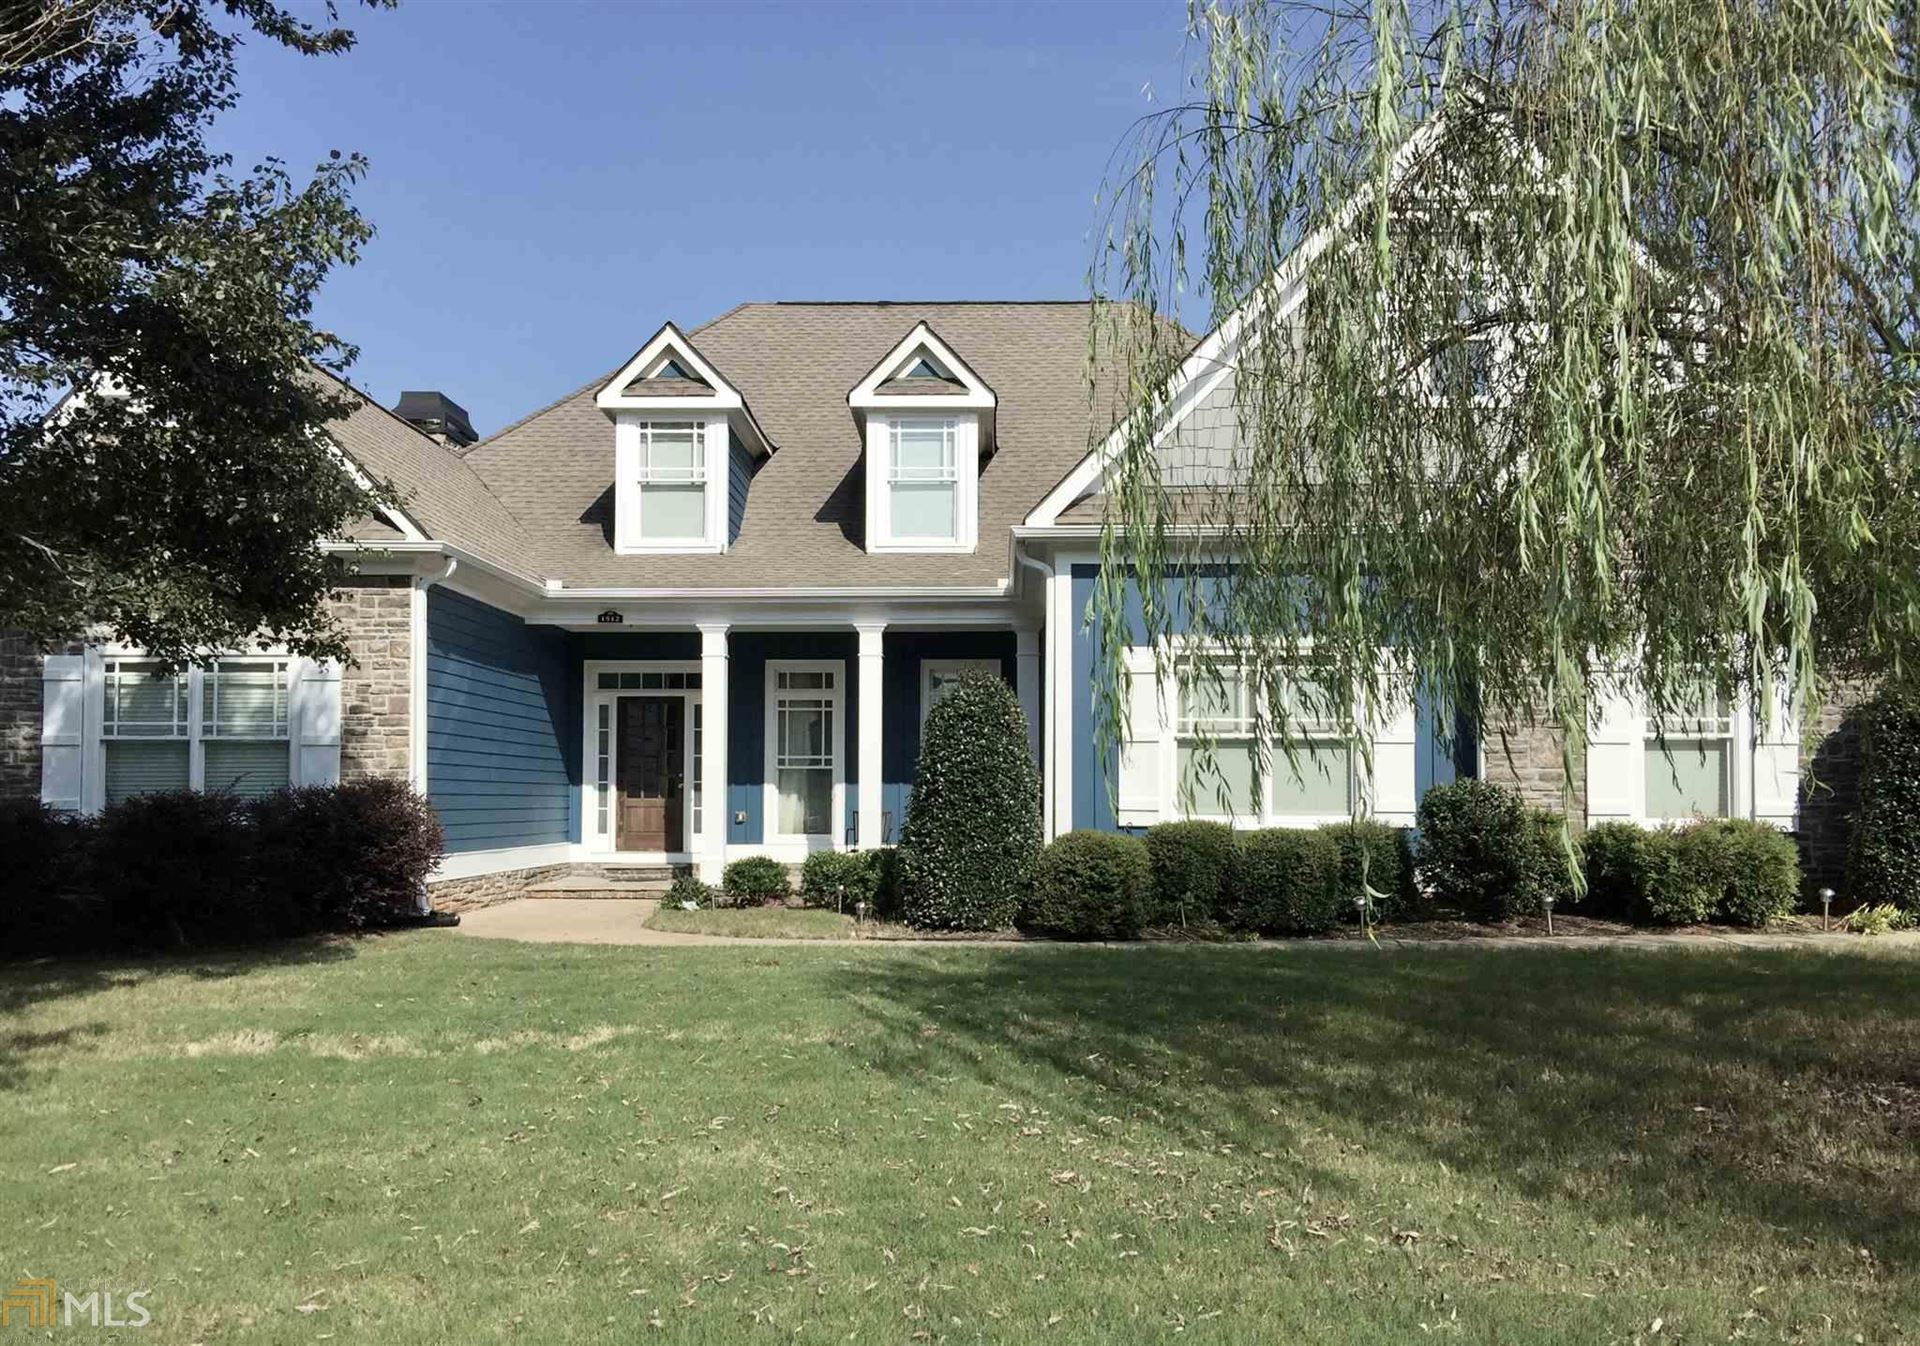 1512 Highland Creek Dr, Monroe, GA 30656 - #: 8727039